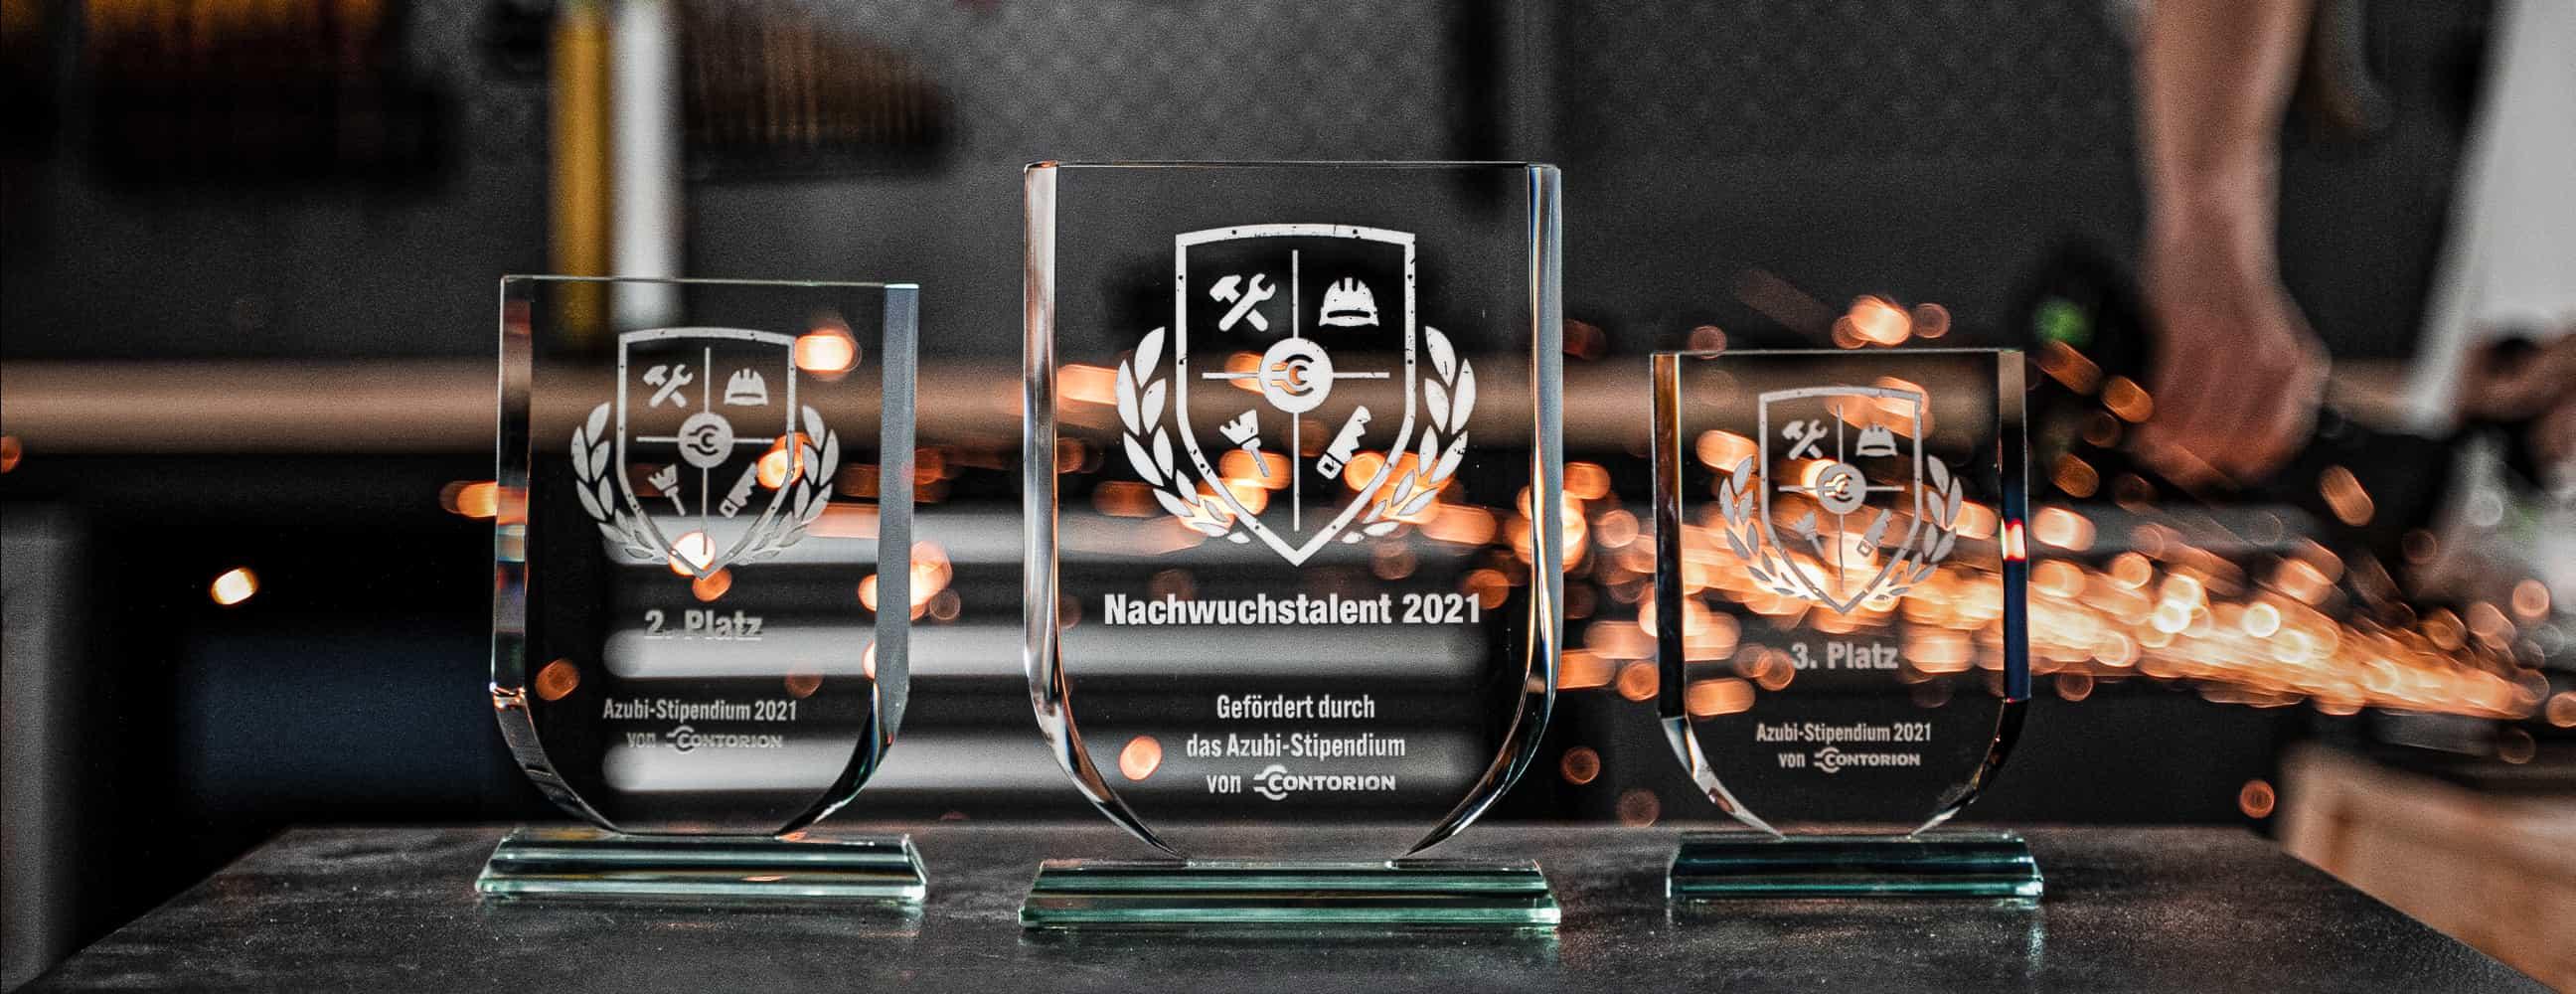 Contorion Azubi Stipendium Pokale 2021